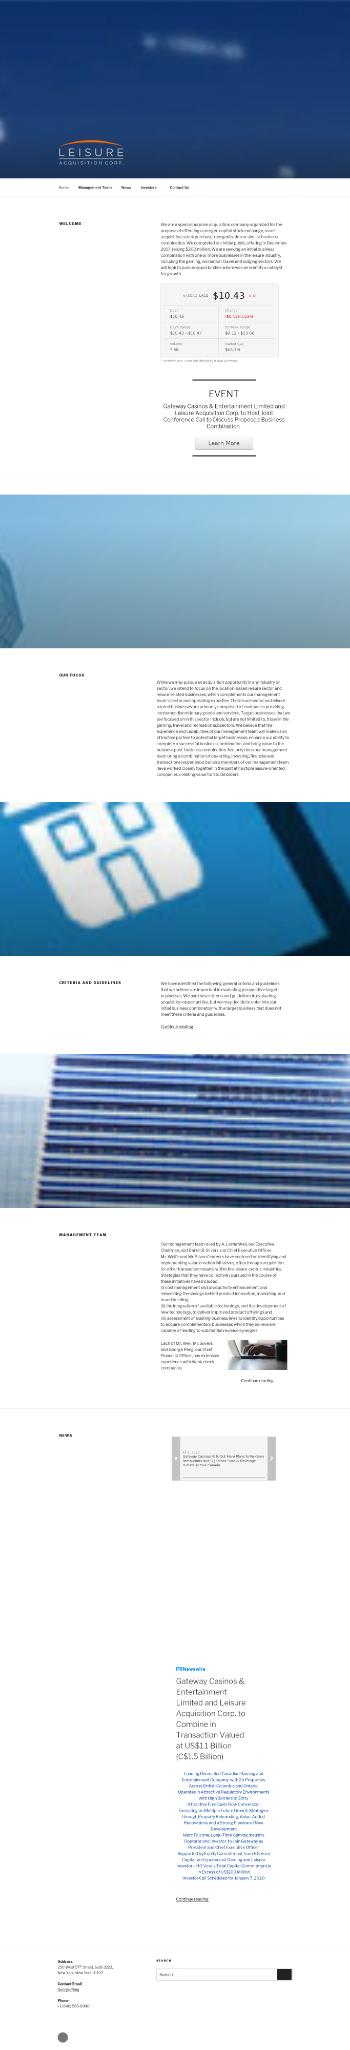 Leisure Acquisition Corp. Website Screenshot